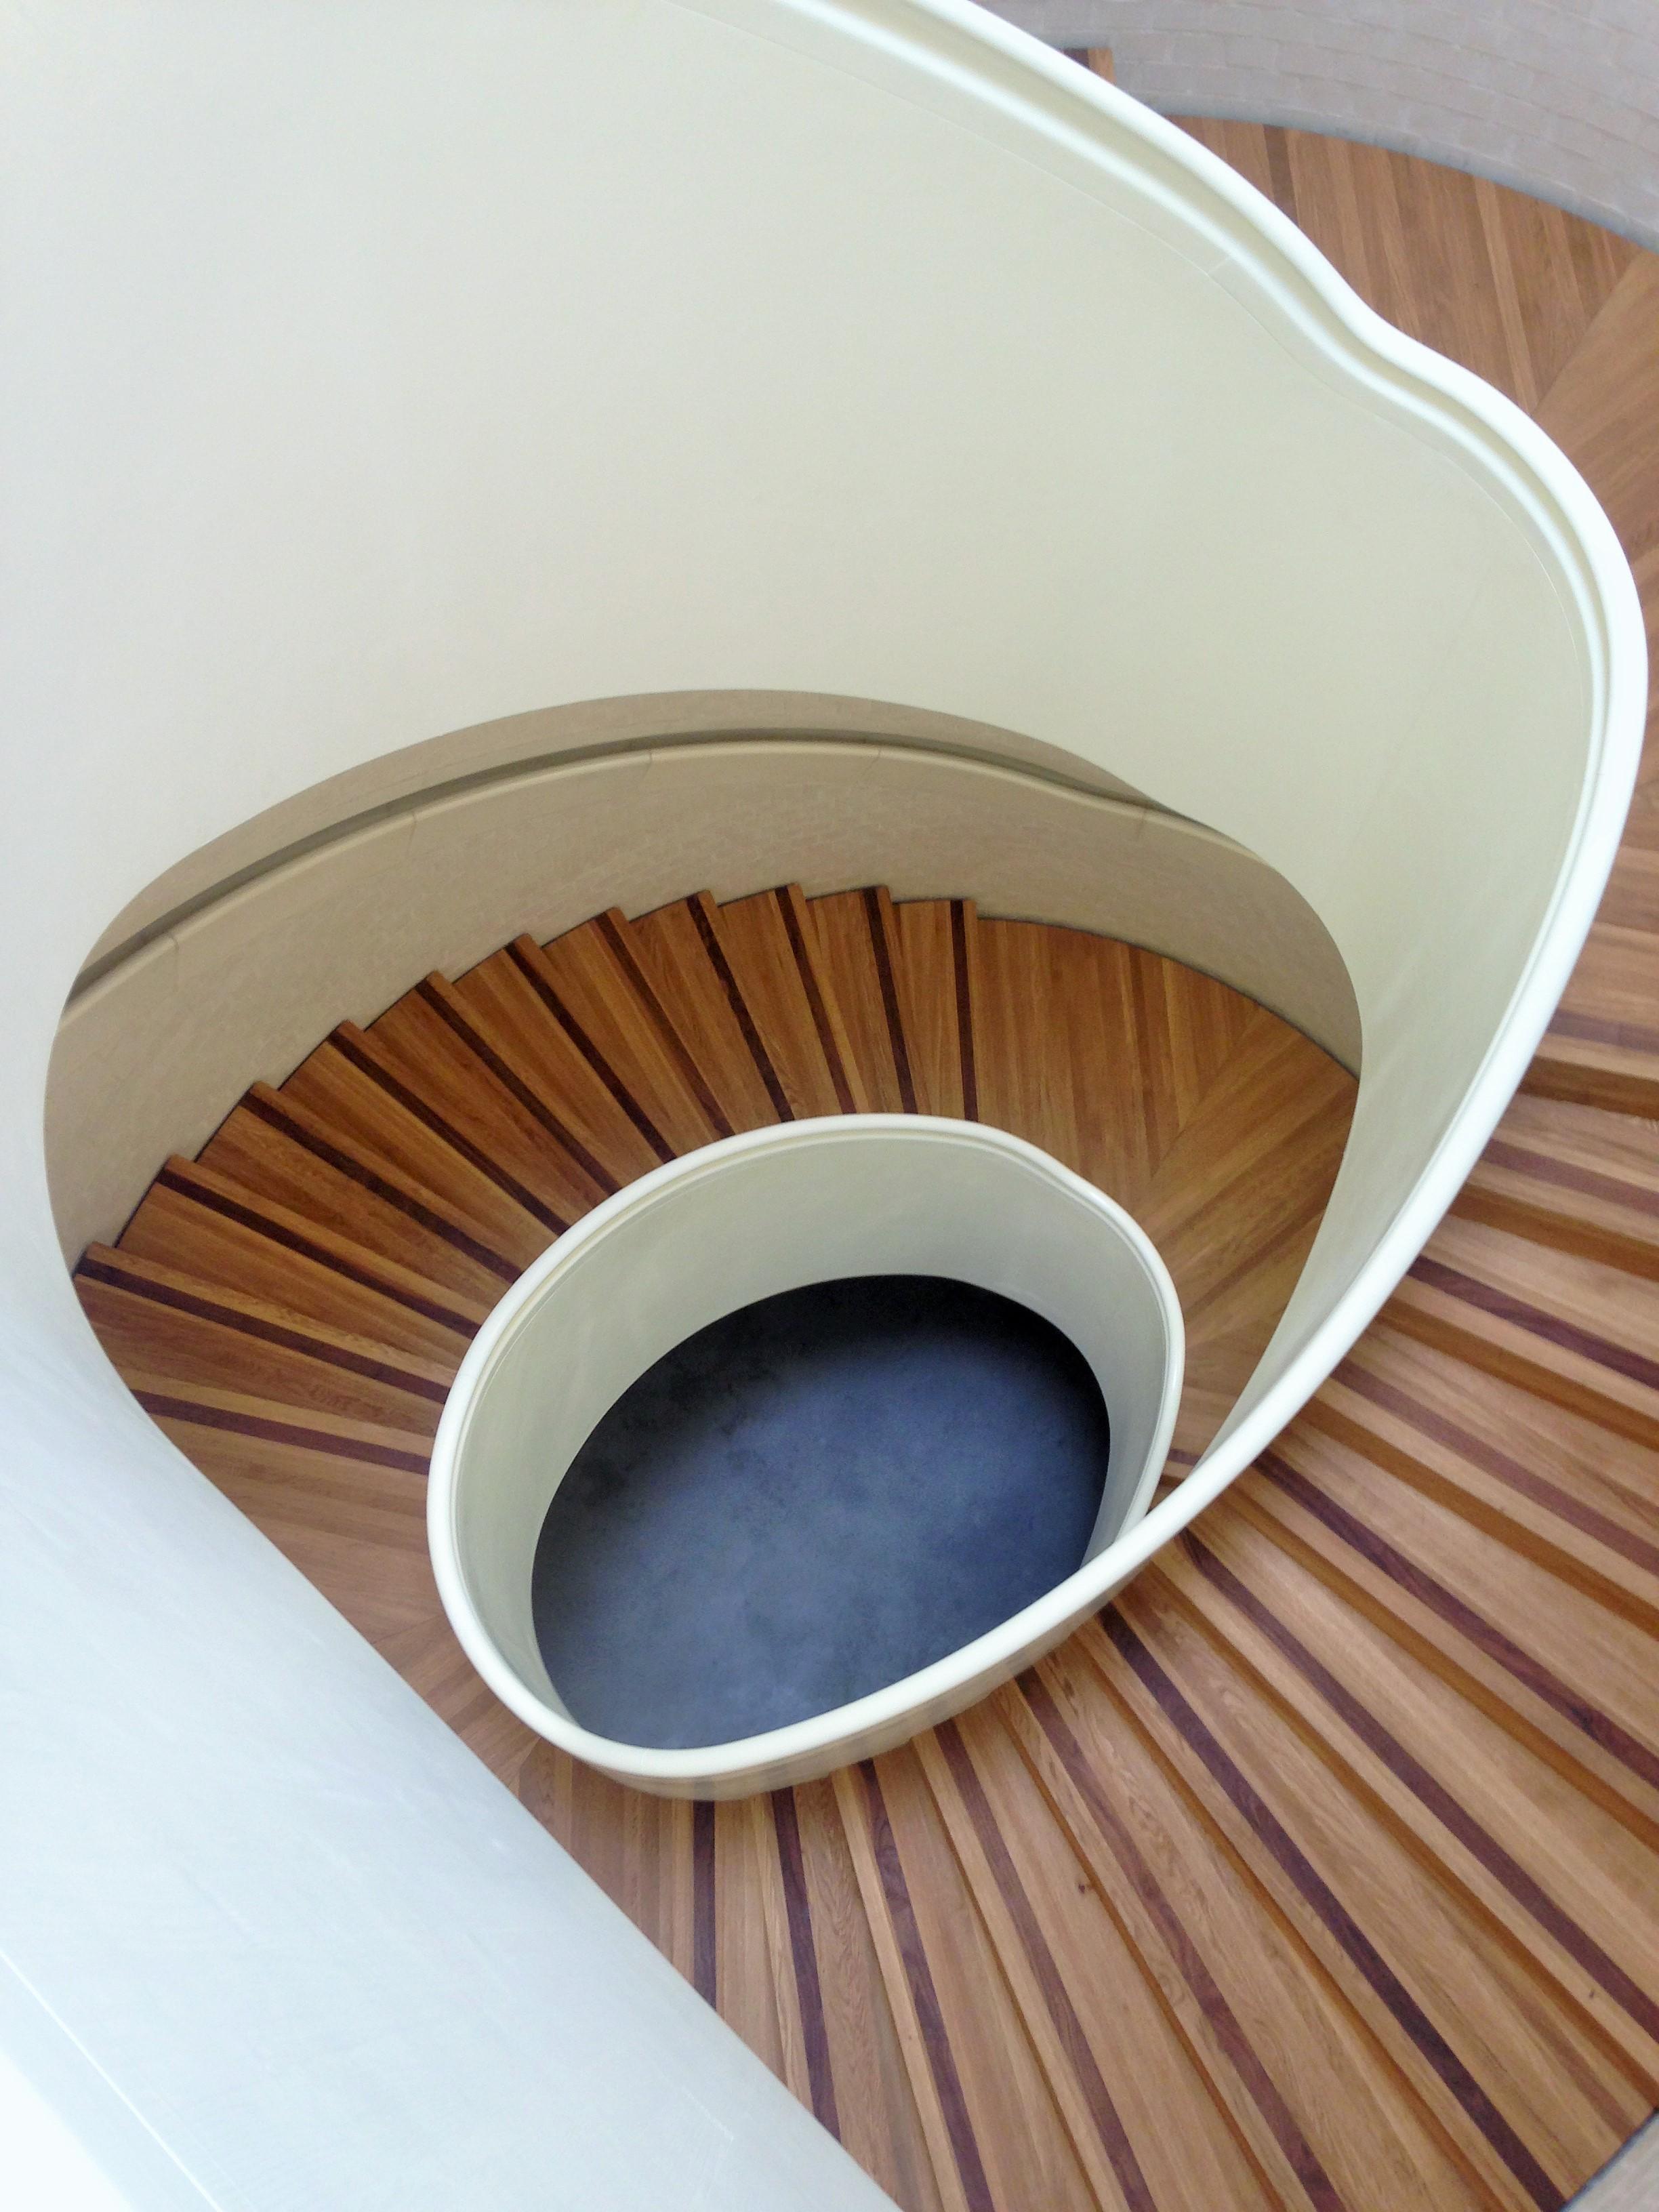 Newport Street Gallery staircase - kenningtonrunoff.om